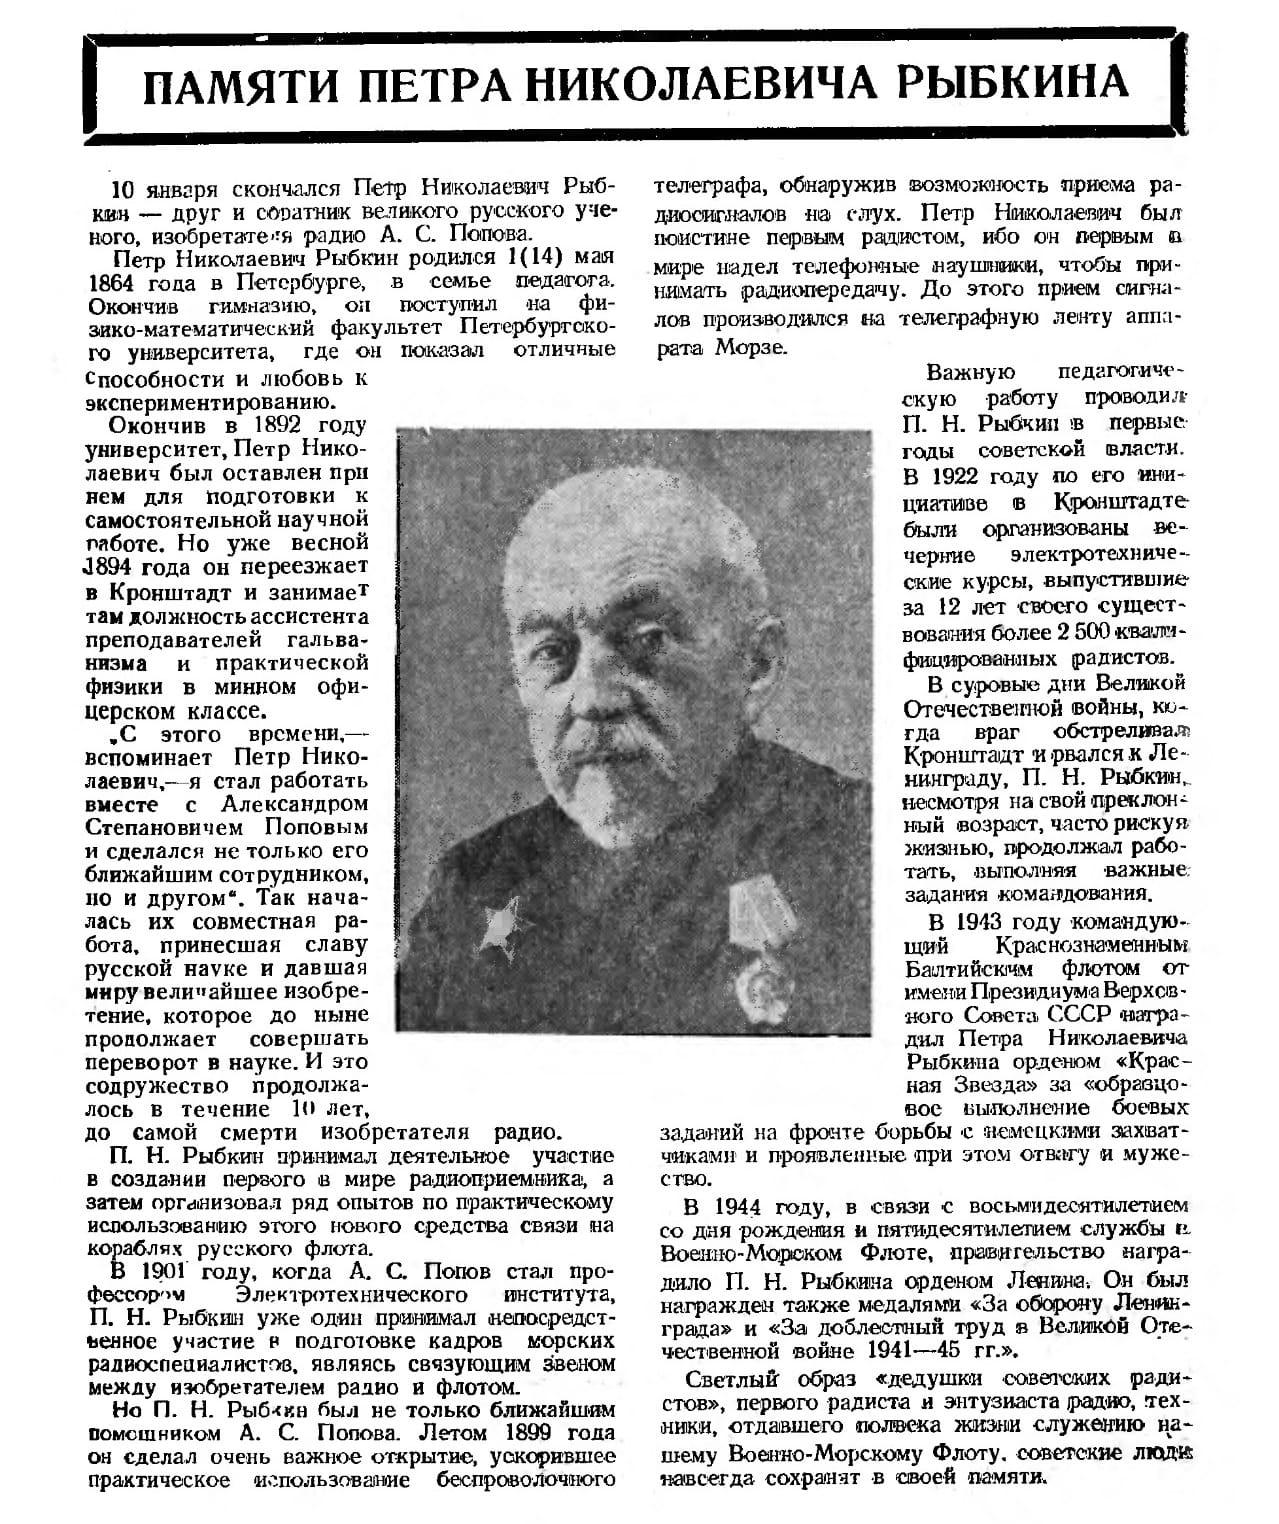 Некролог Петра Николаевича Рыбкина